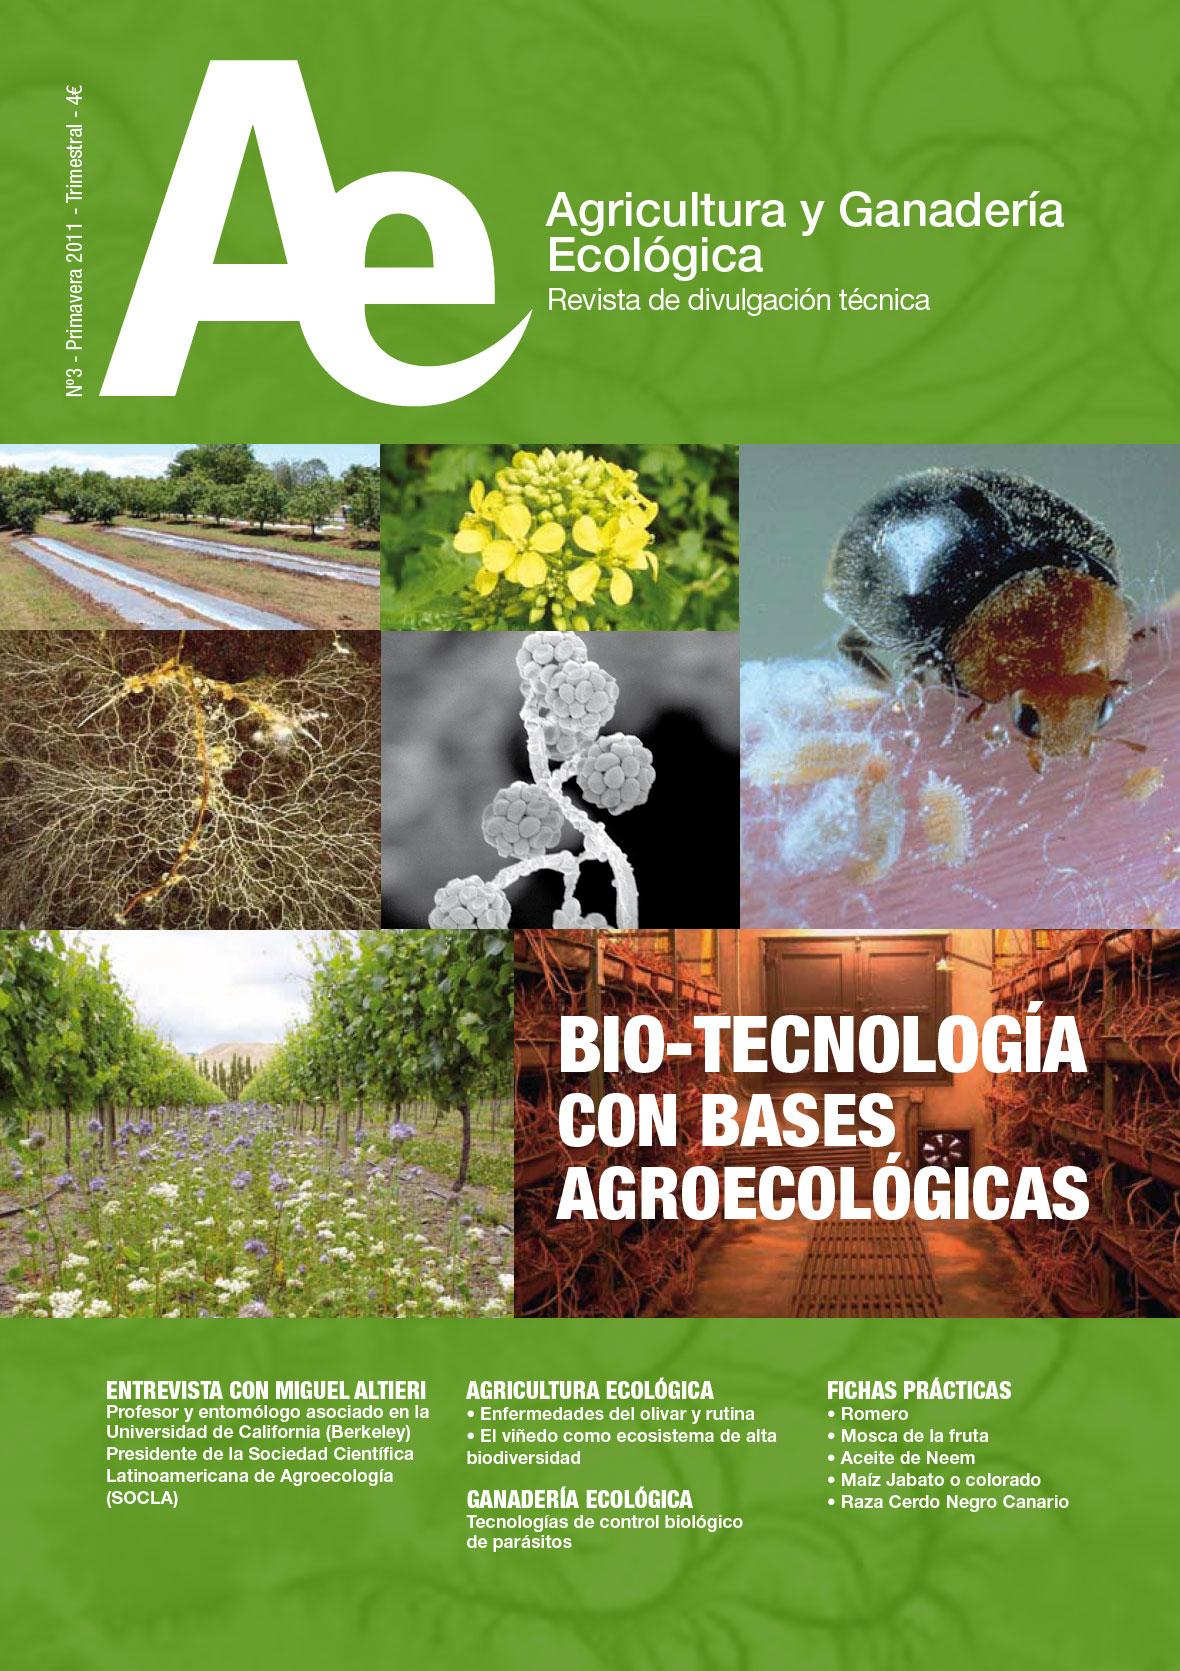 Cover of Enfermedades del olivar y rutina